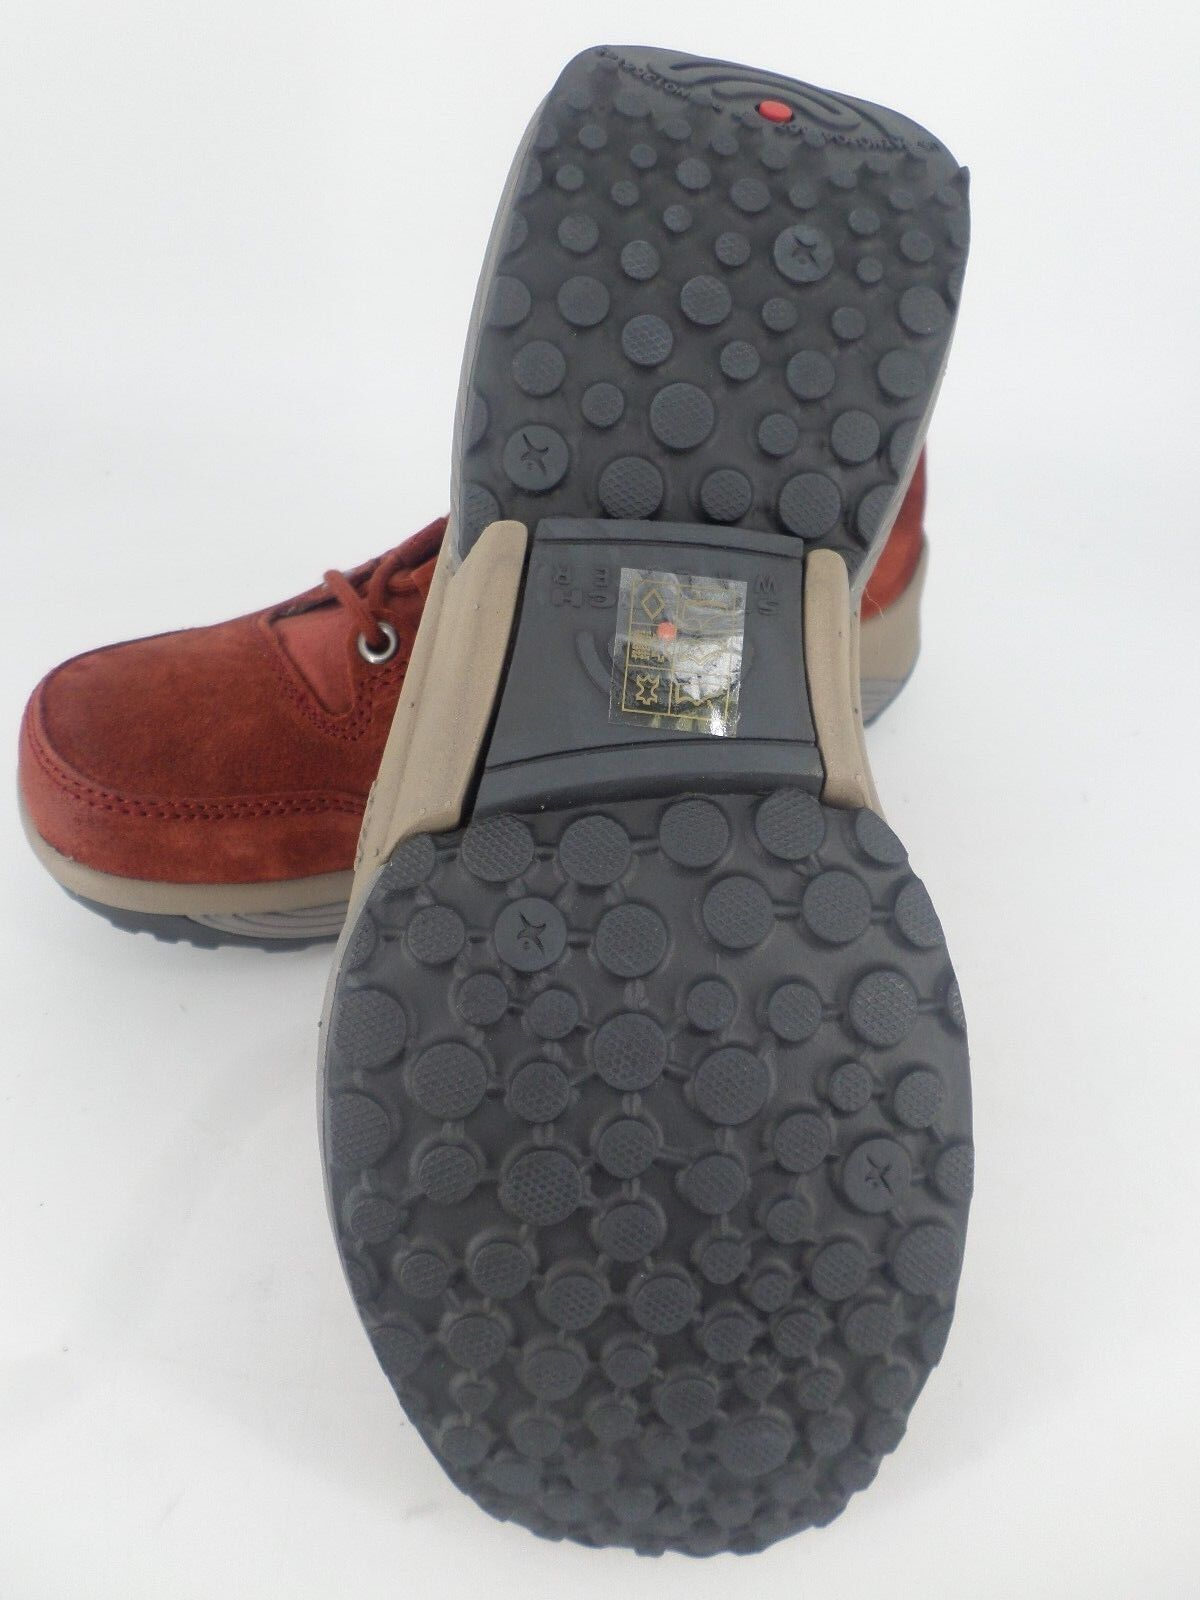 Xsensible Stretchwalker Stretch Walker Helios shoes Red UK 5 5 5 EU 38 G Fit LN40 73 da0d7f